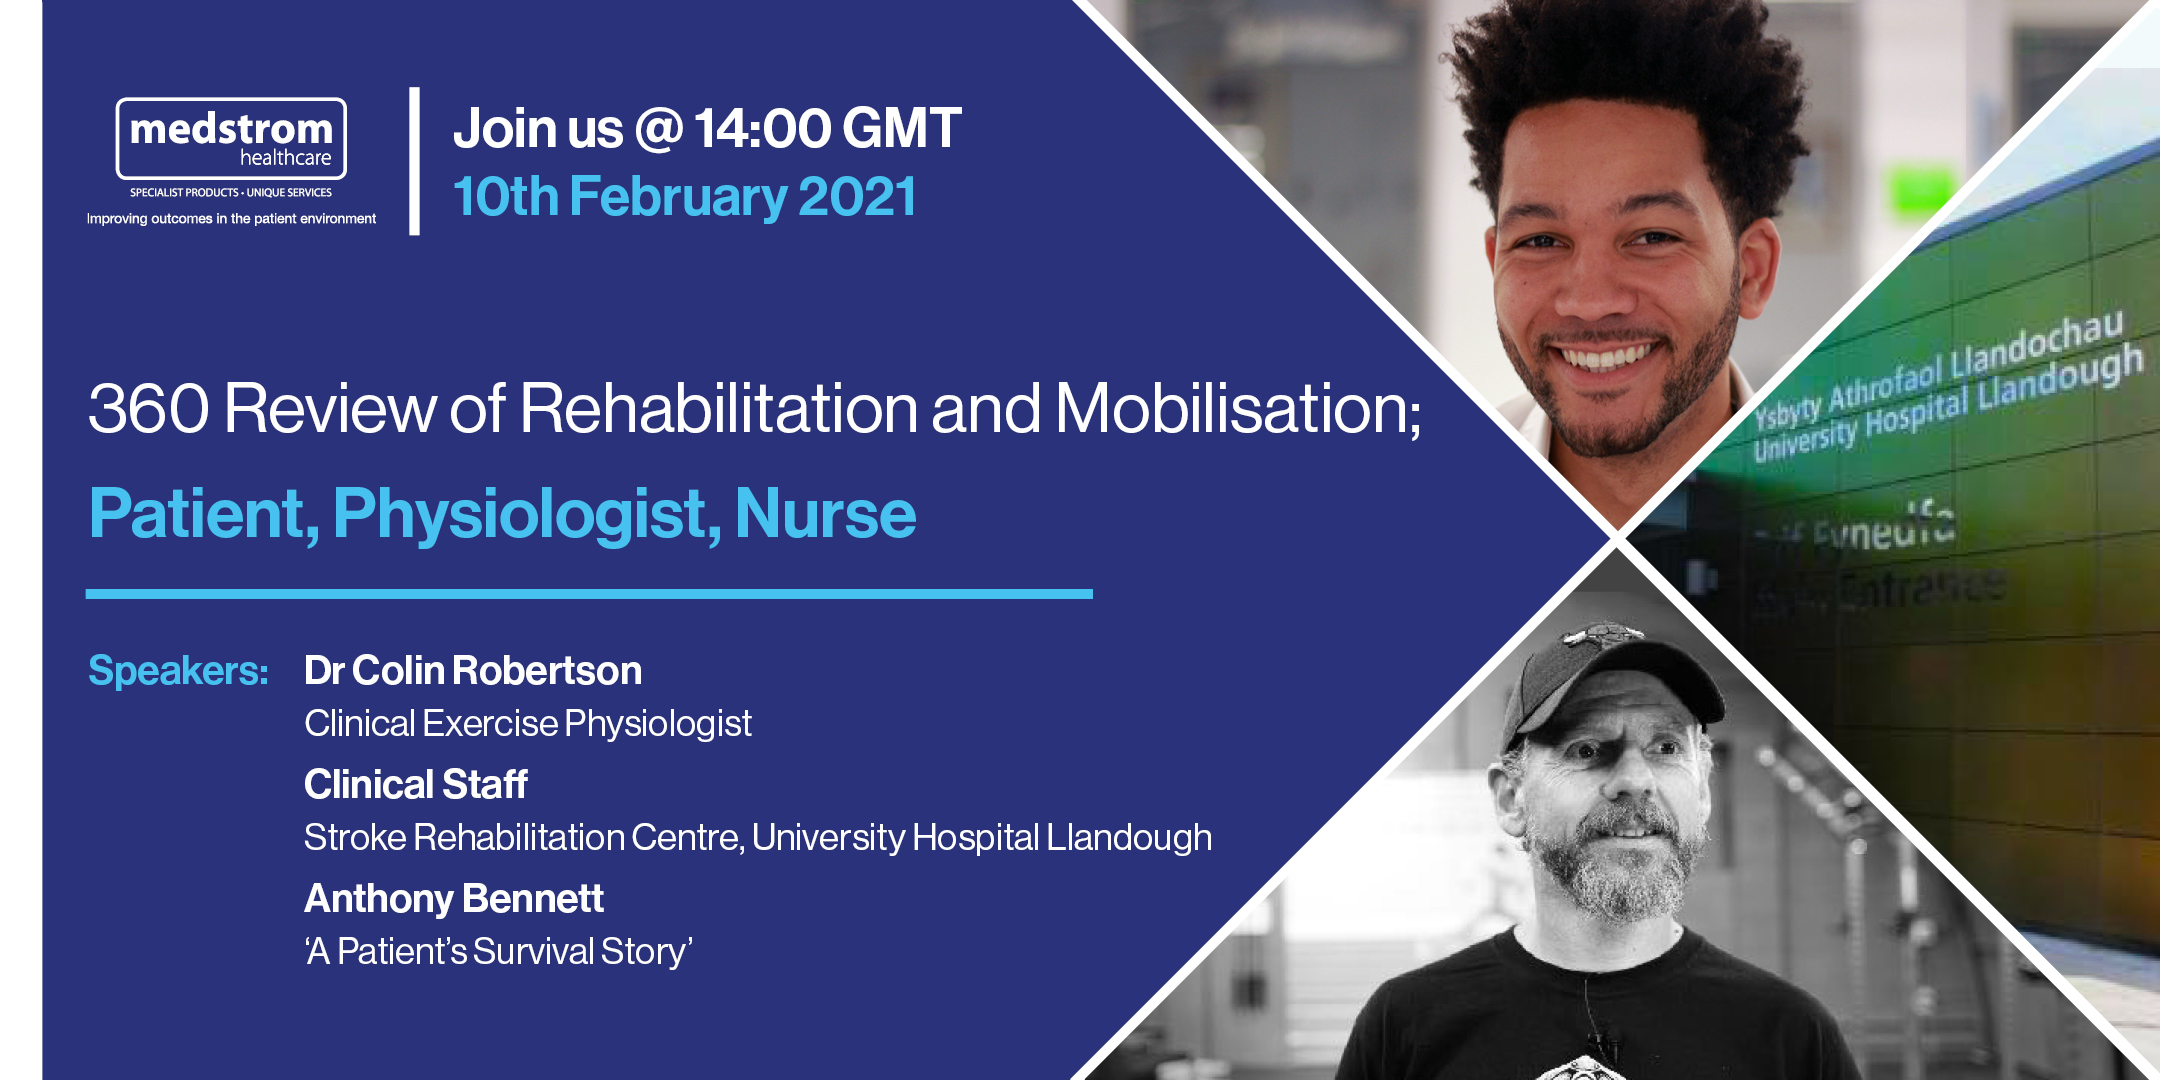 Medstrom Webinar - '360 review of rehabilitation and mobilisation; Patient, Physiologist, Nurse'